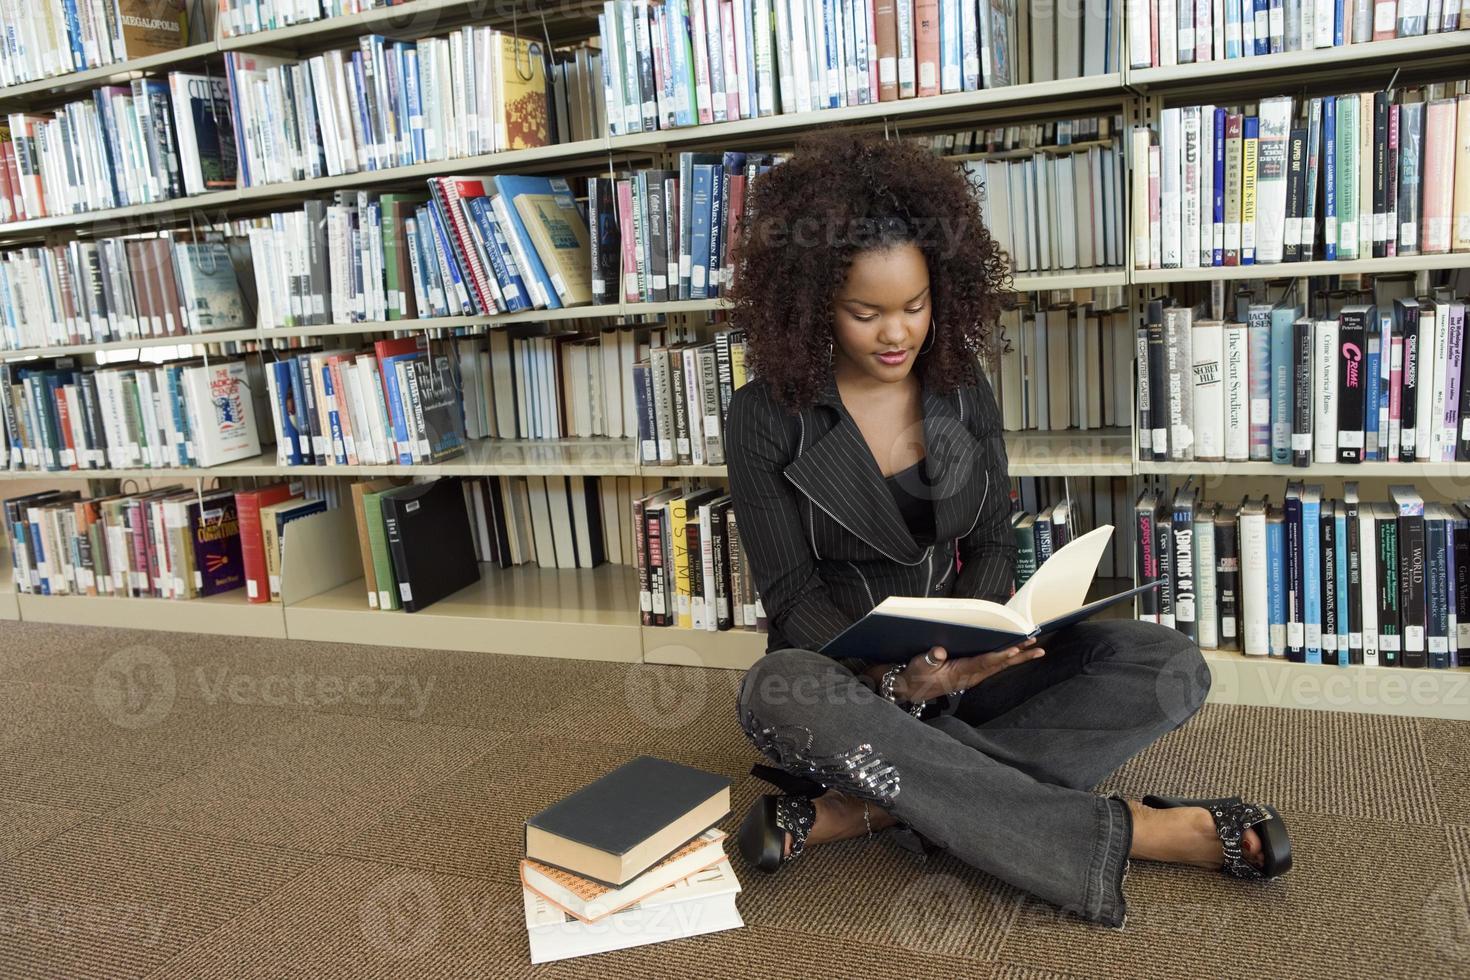 junge Frau in der Bibliothek foto